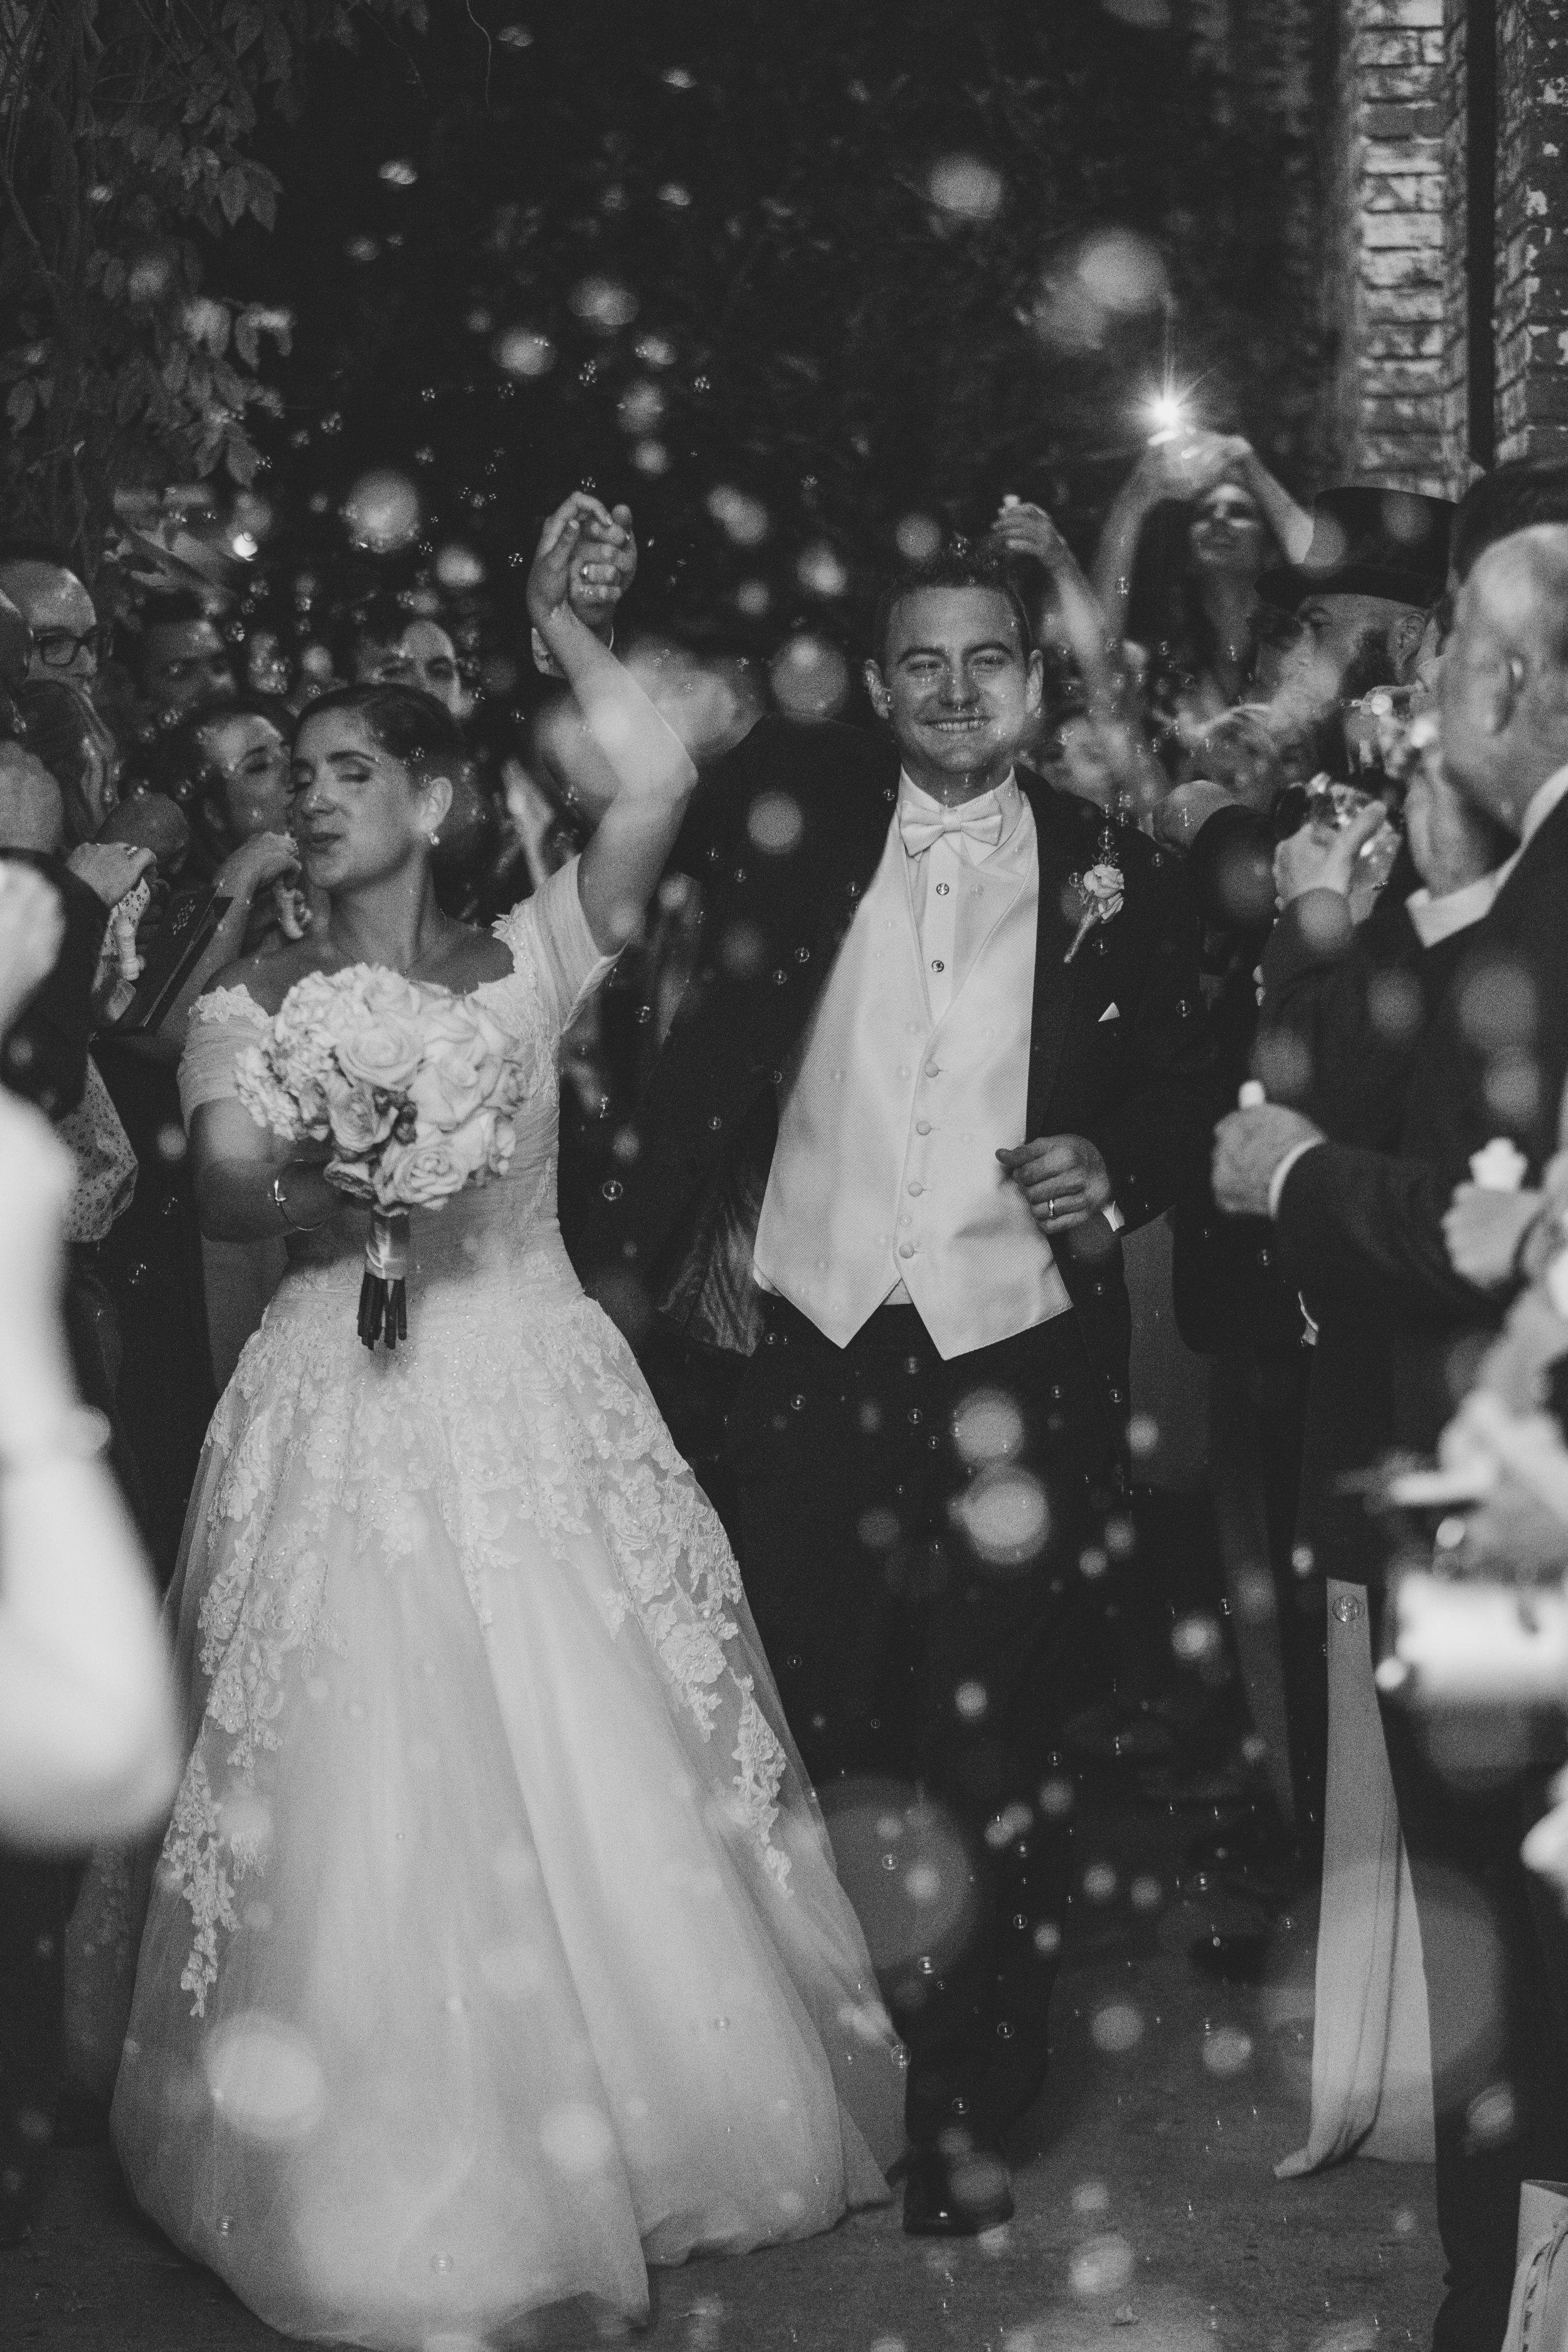 ATGI_Magali & Josh Wedding1_2S8A3052.jpg